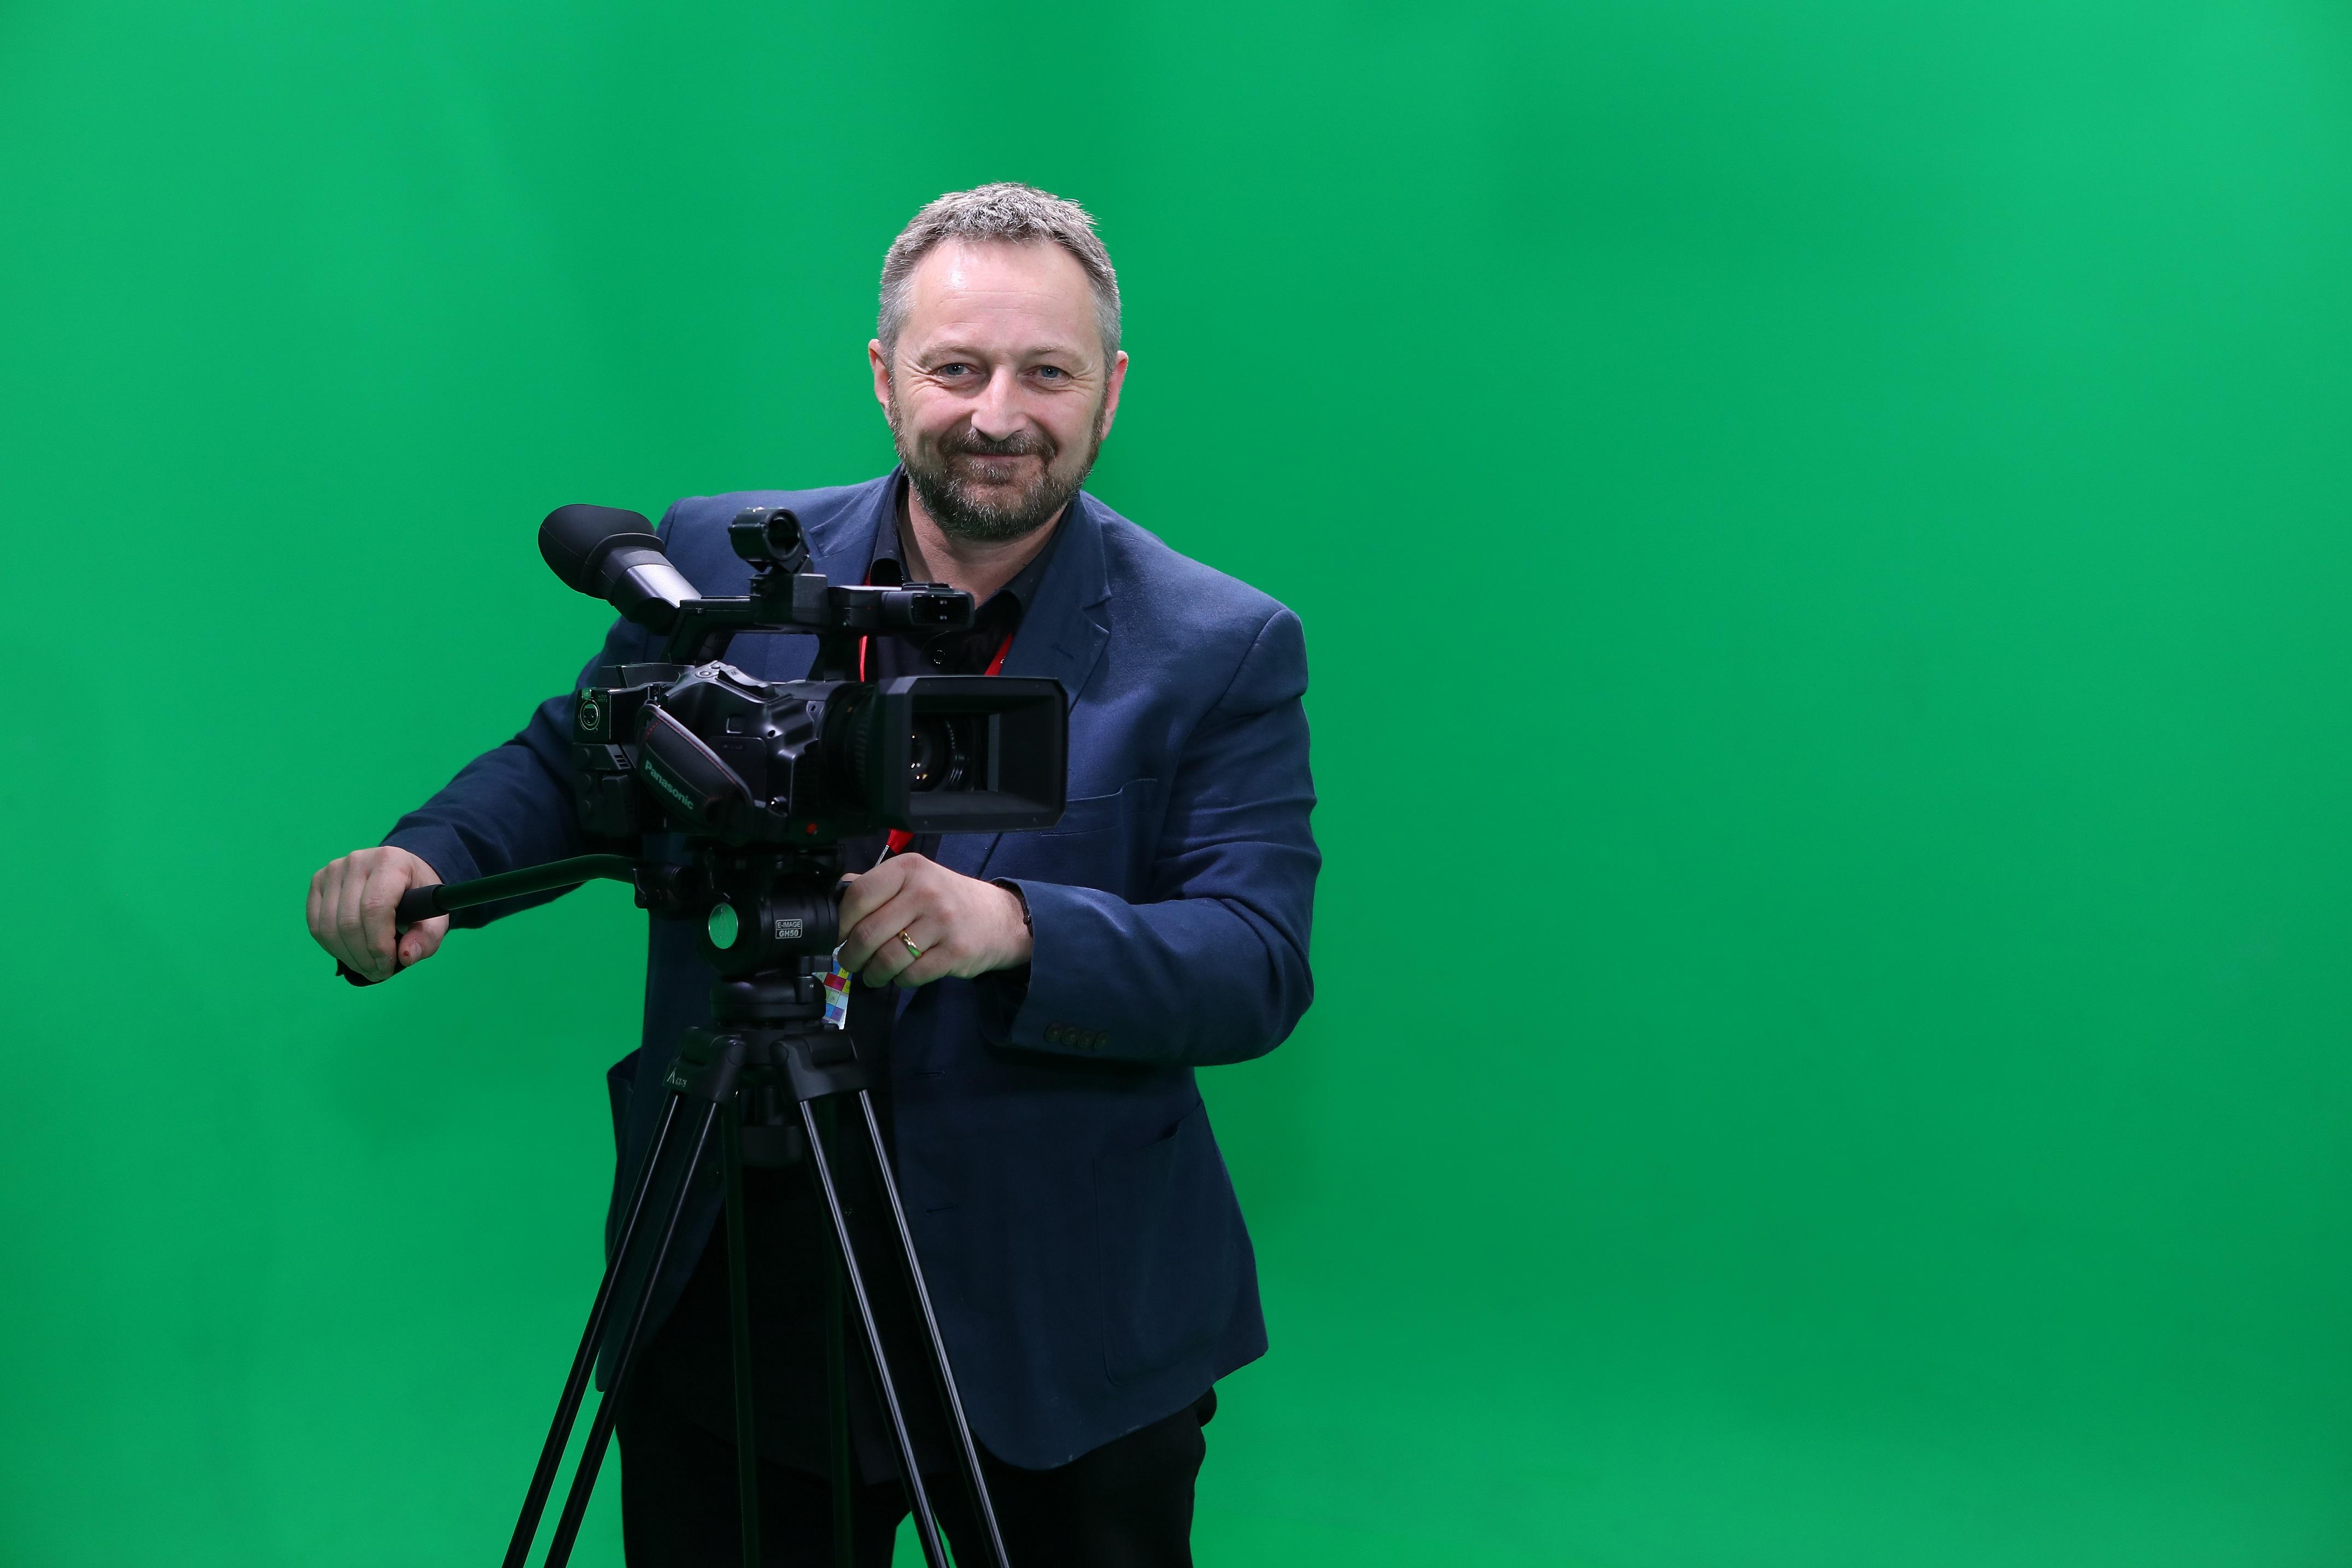 IB film studies teacher Darren Ormandy